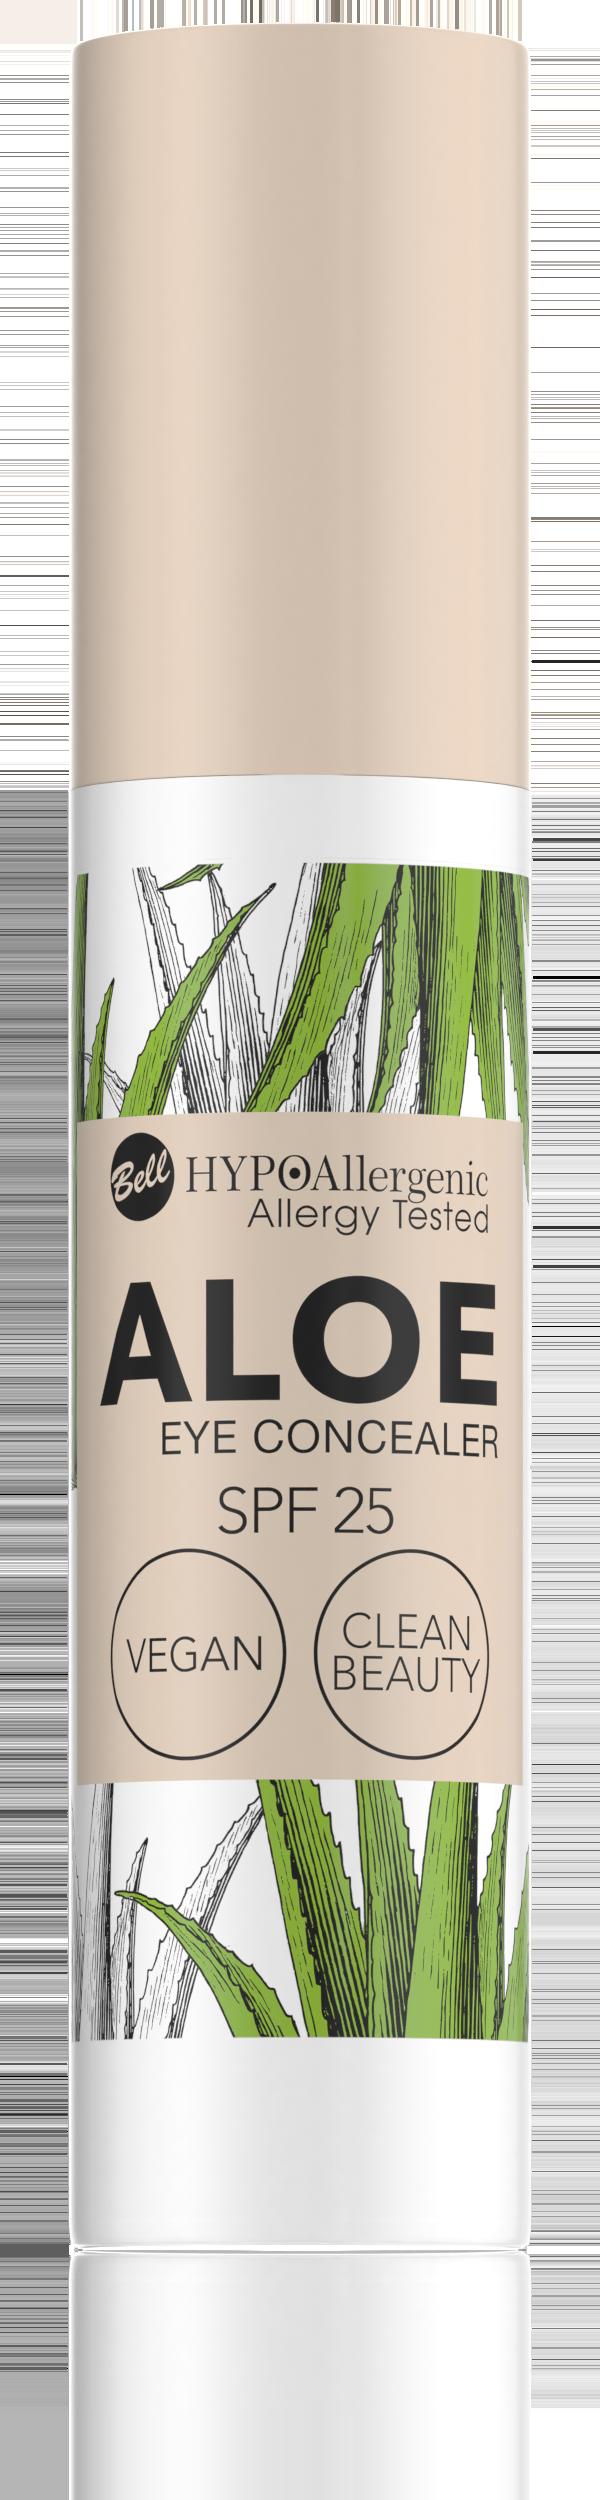 HYPOAllergenic Aloe Eye Concealer SPF 25